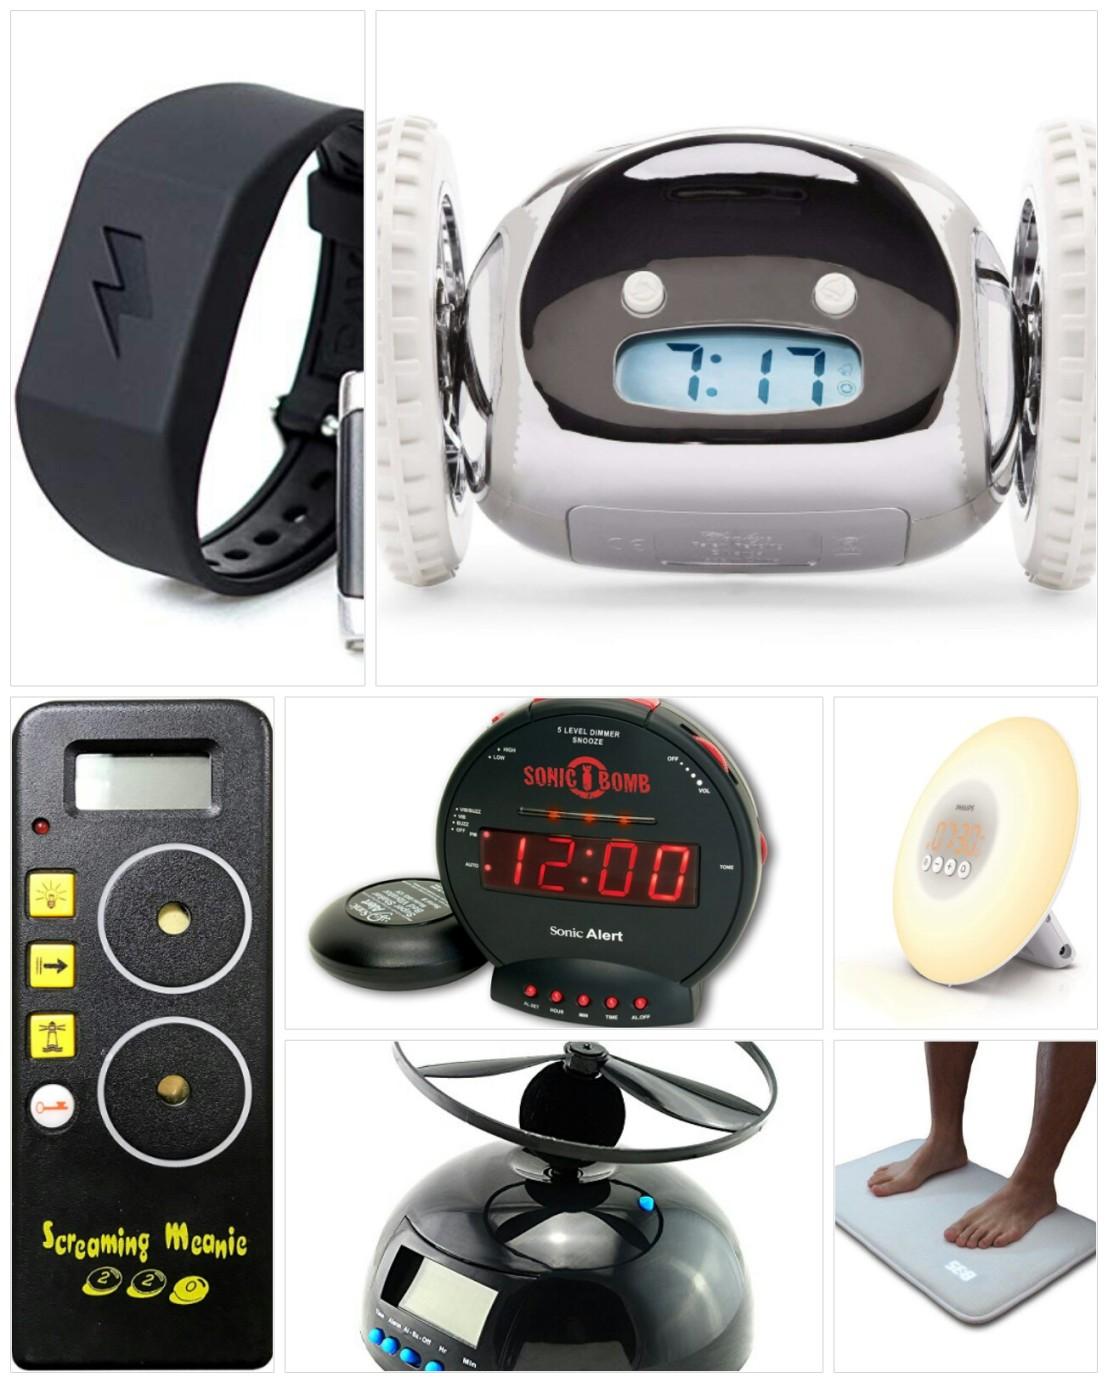 Bizarre alarm clocks - collage